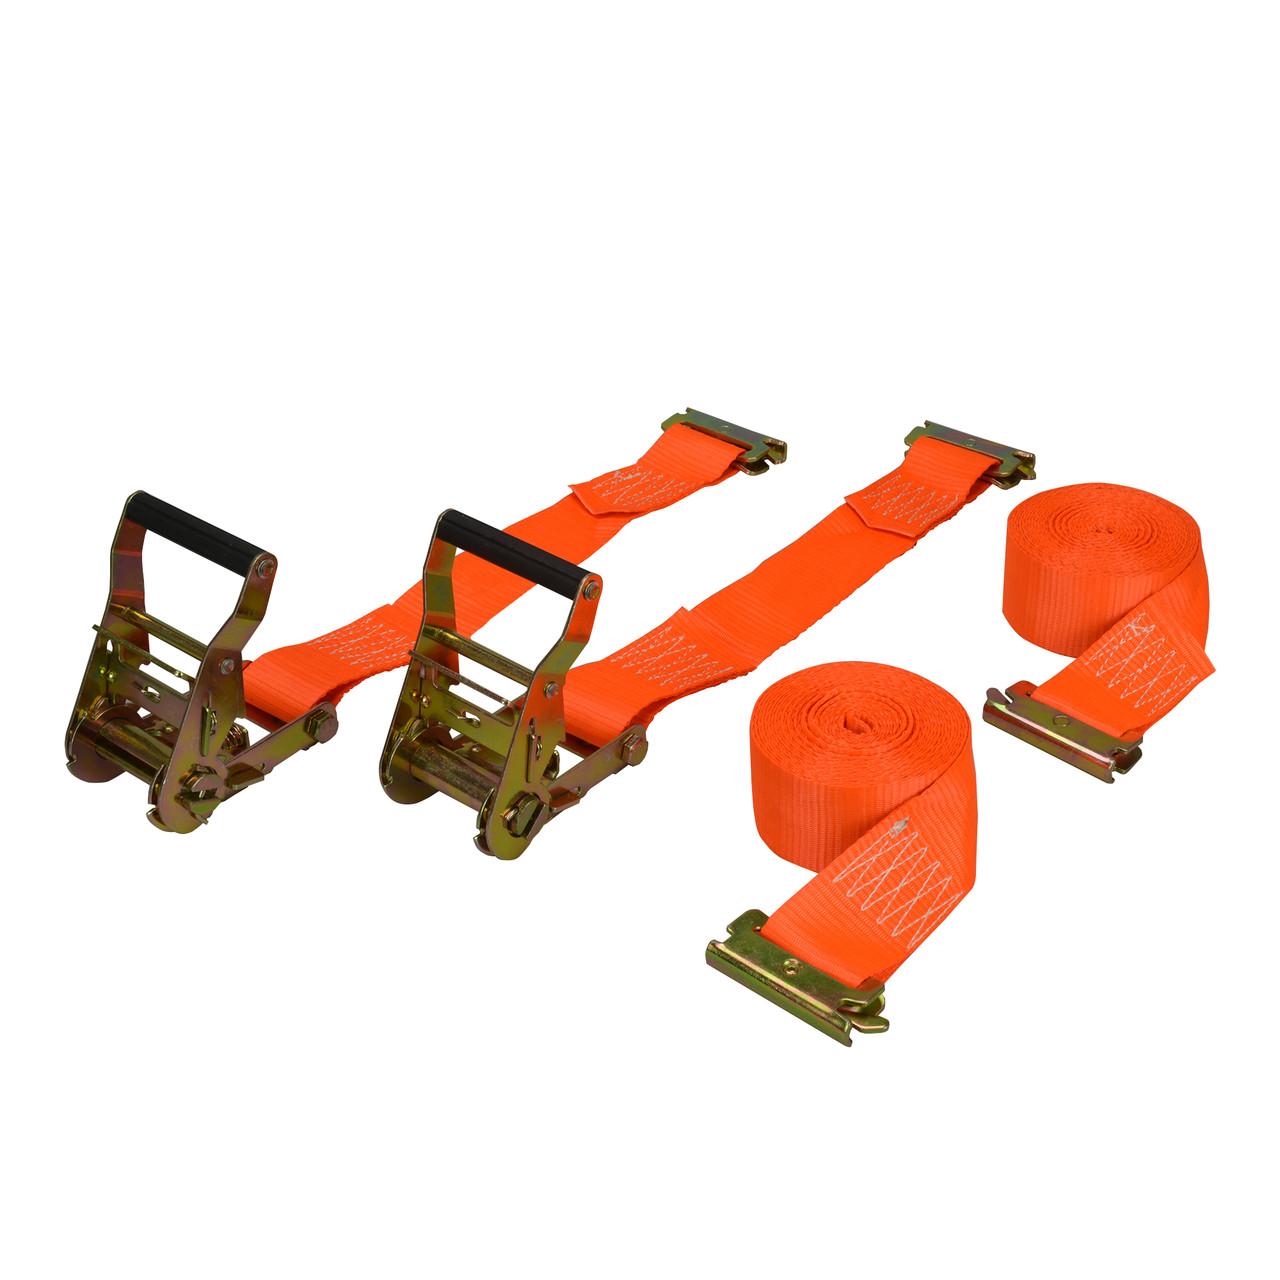 "CS899 --- E-Track/X-Track Ratchet Strap 2""x16' - 2 pack"